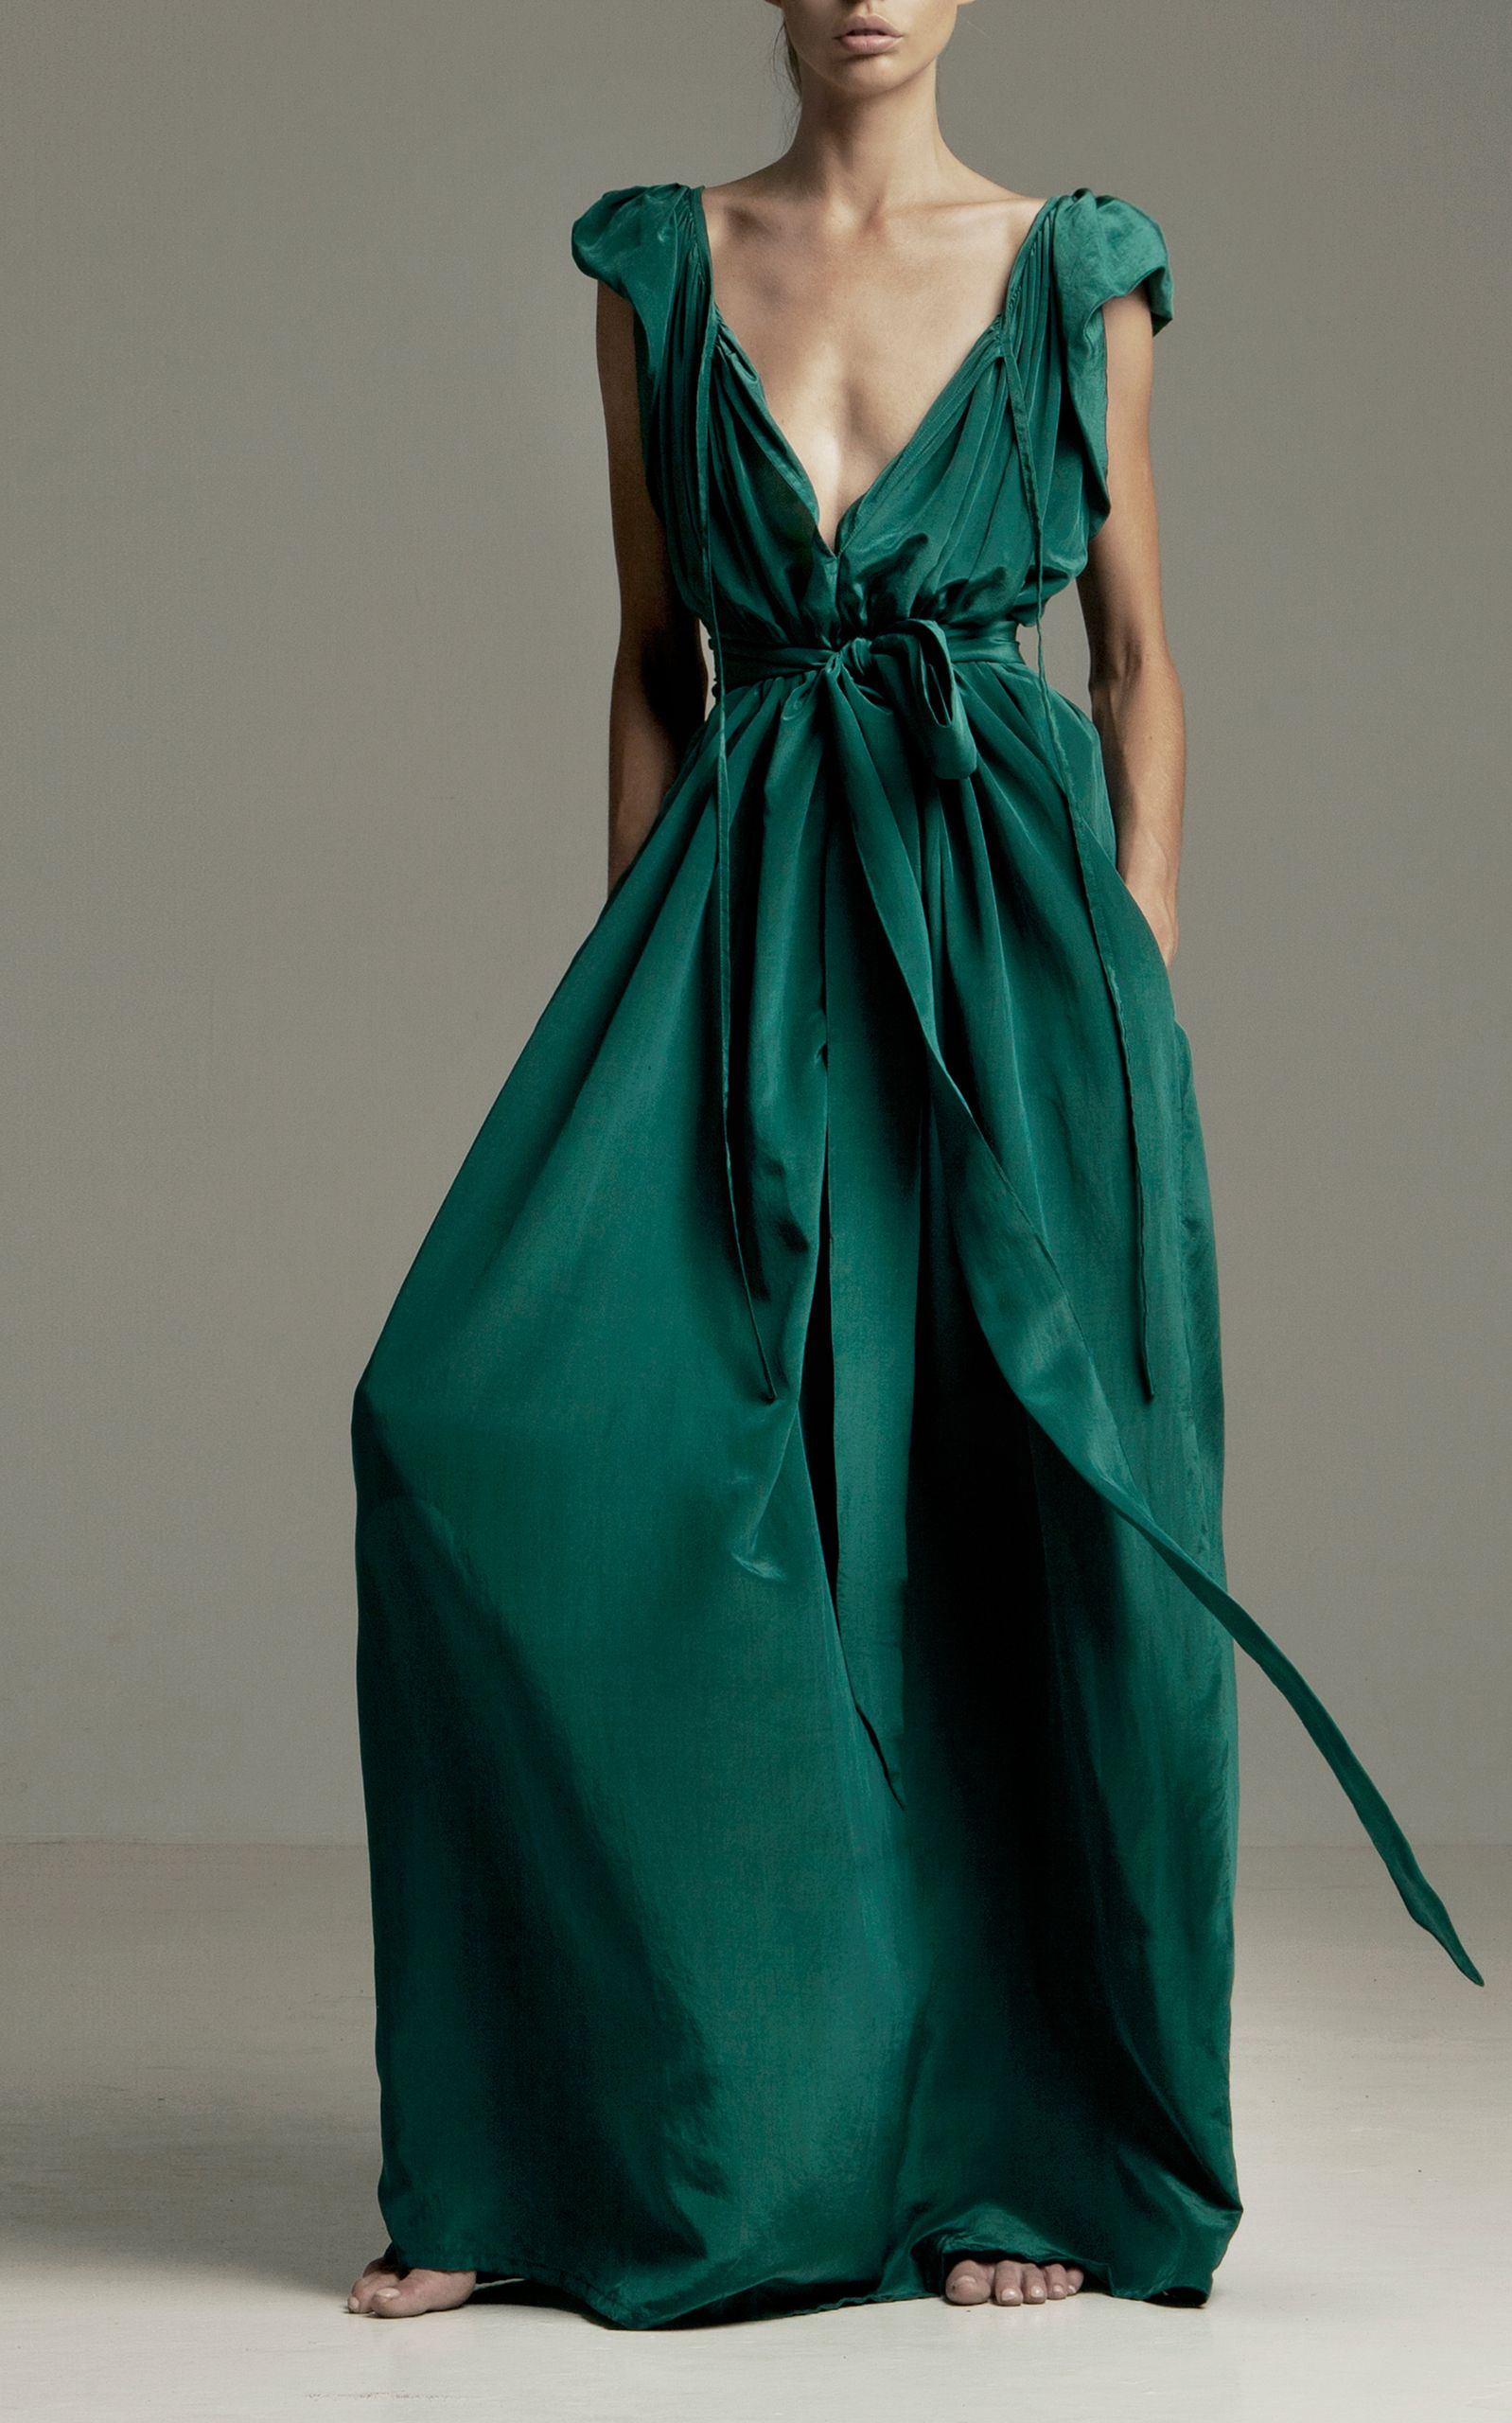 d1ce78dcc5 Andromeda Nights Maxi Dress by KALITA for Preorder on Moda Operandi